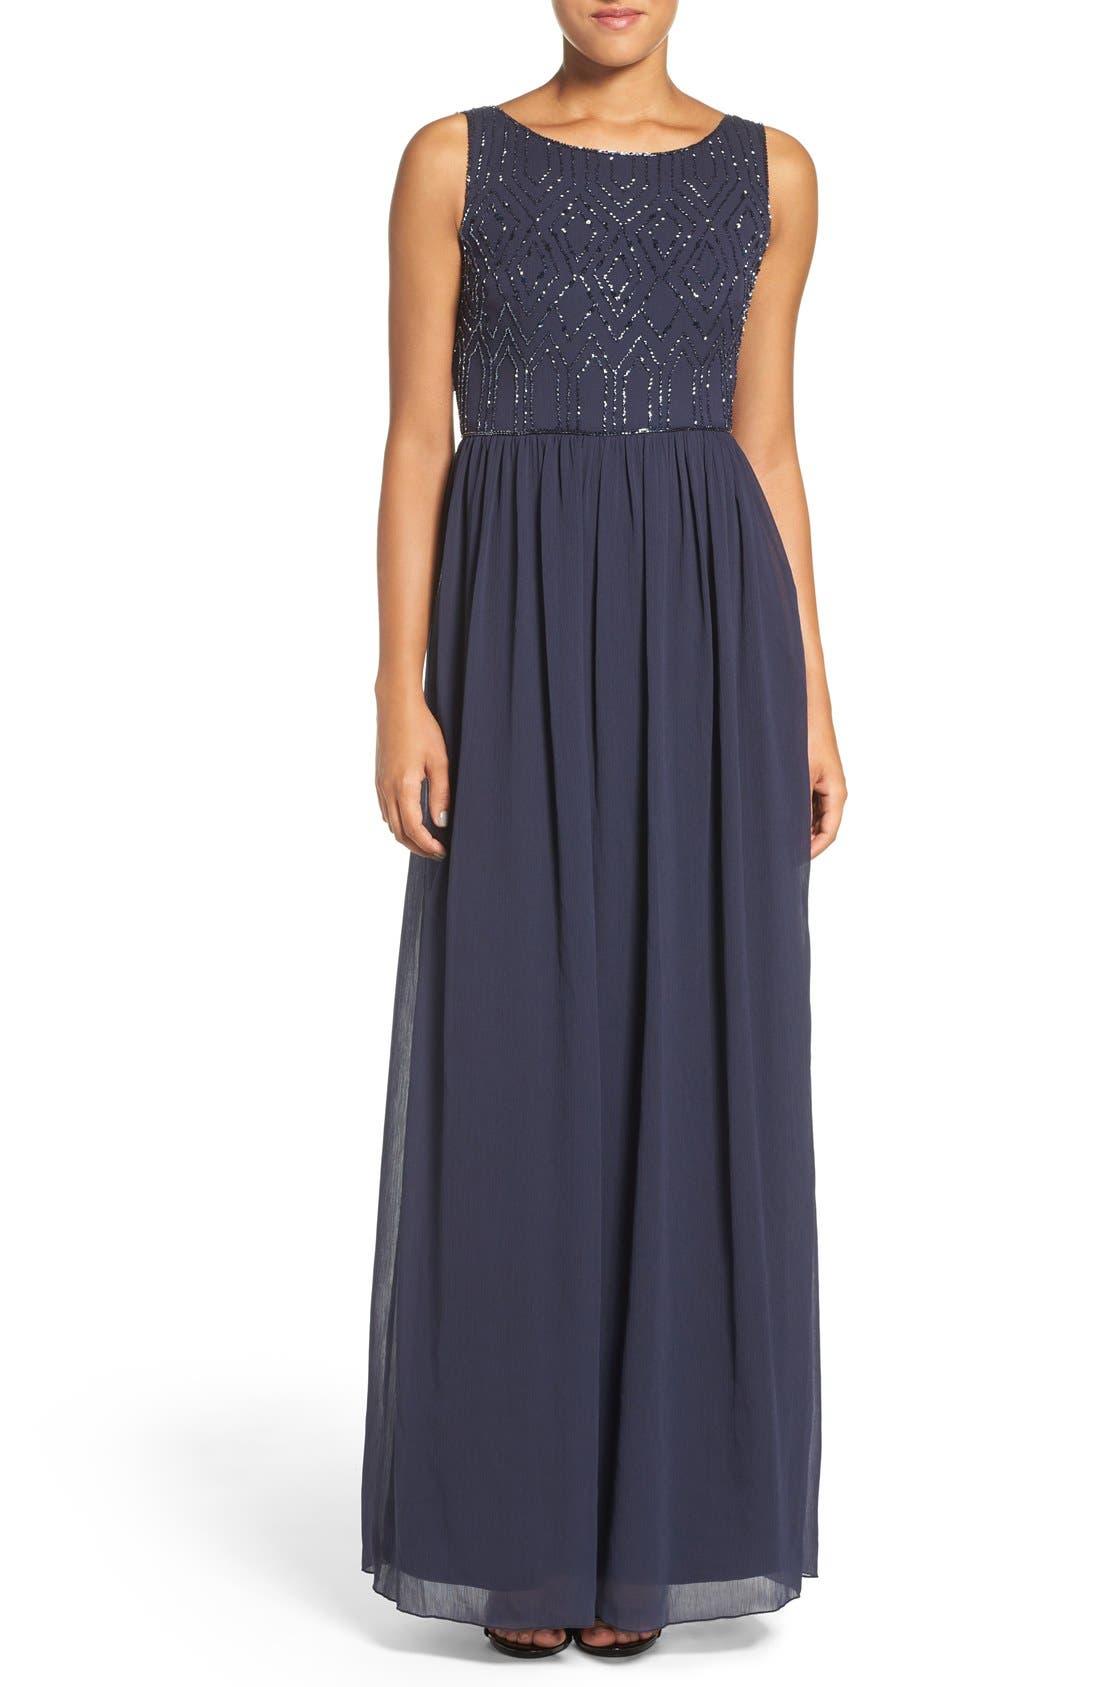 Alternate Image 1 Selected - Adrianna Papell Embellished Bodice Sleeveless Chiffon Gown